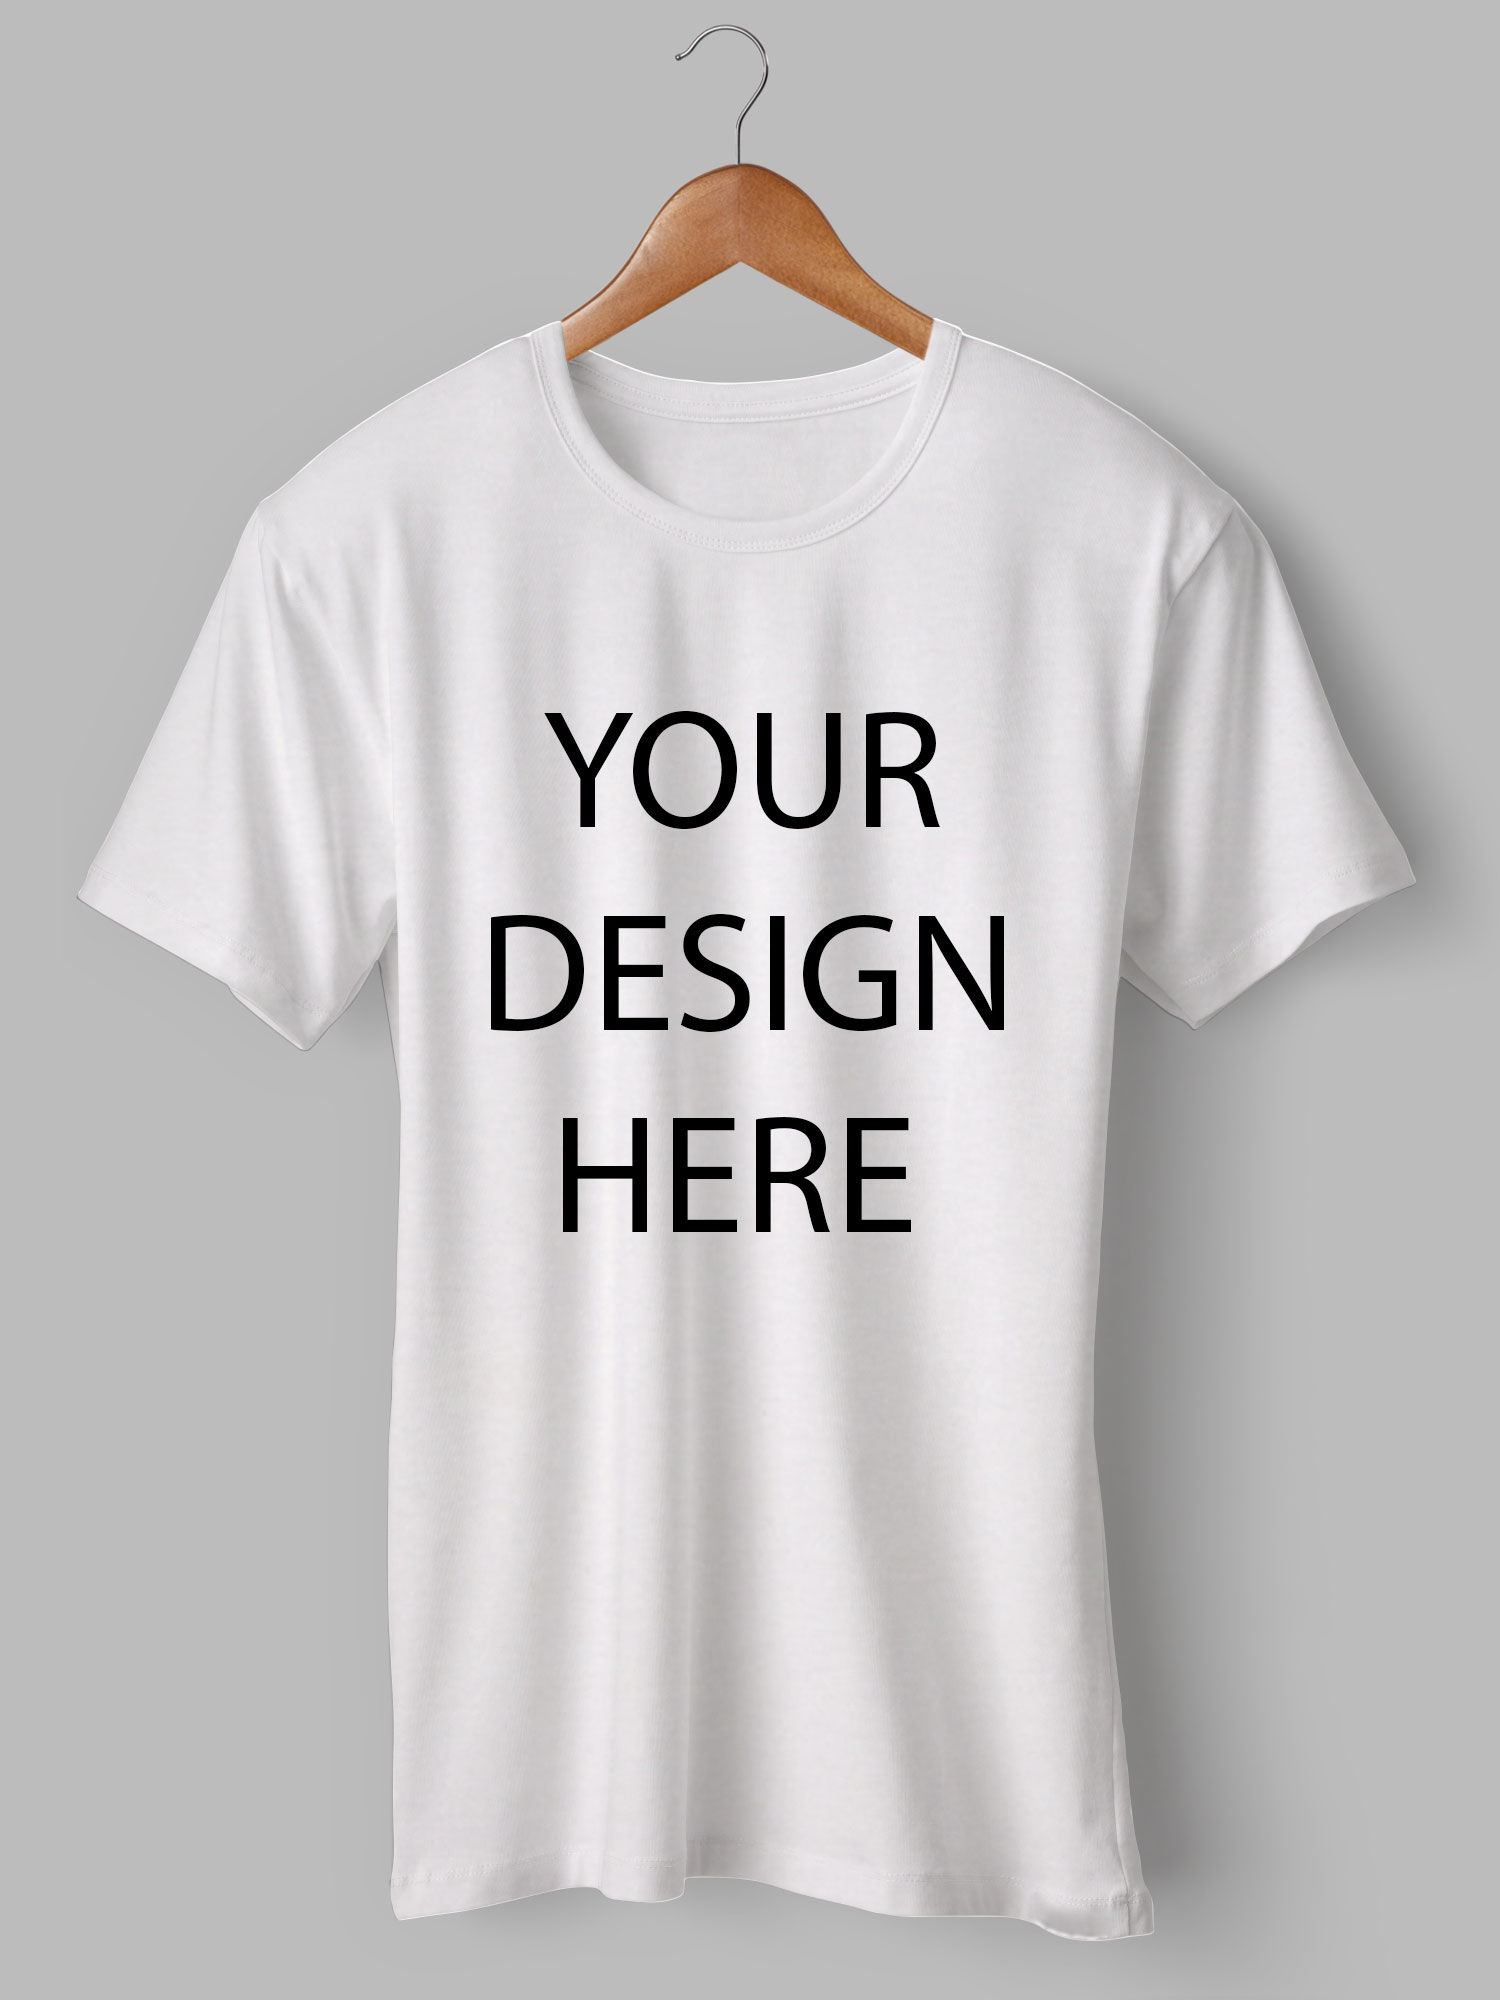 Customized Round Neck White T-Shirt | Printe5